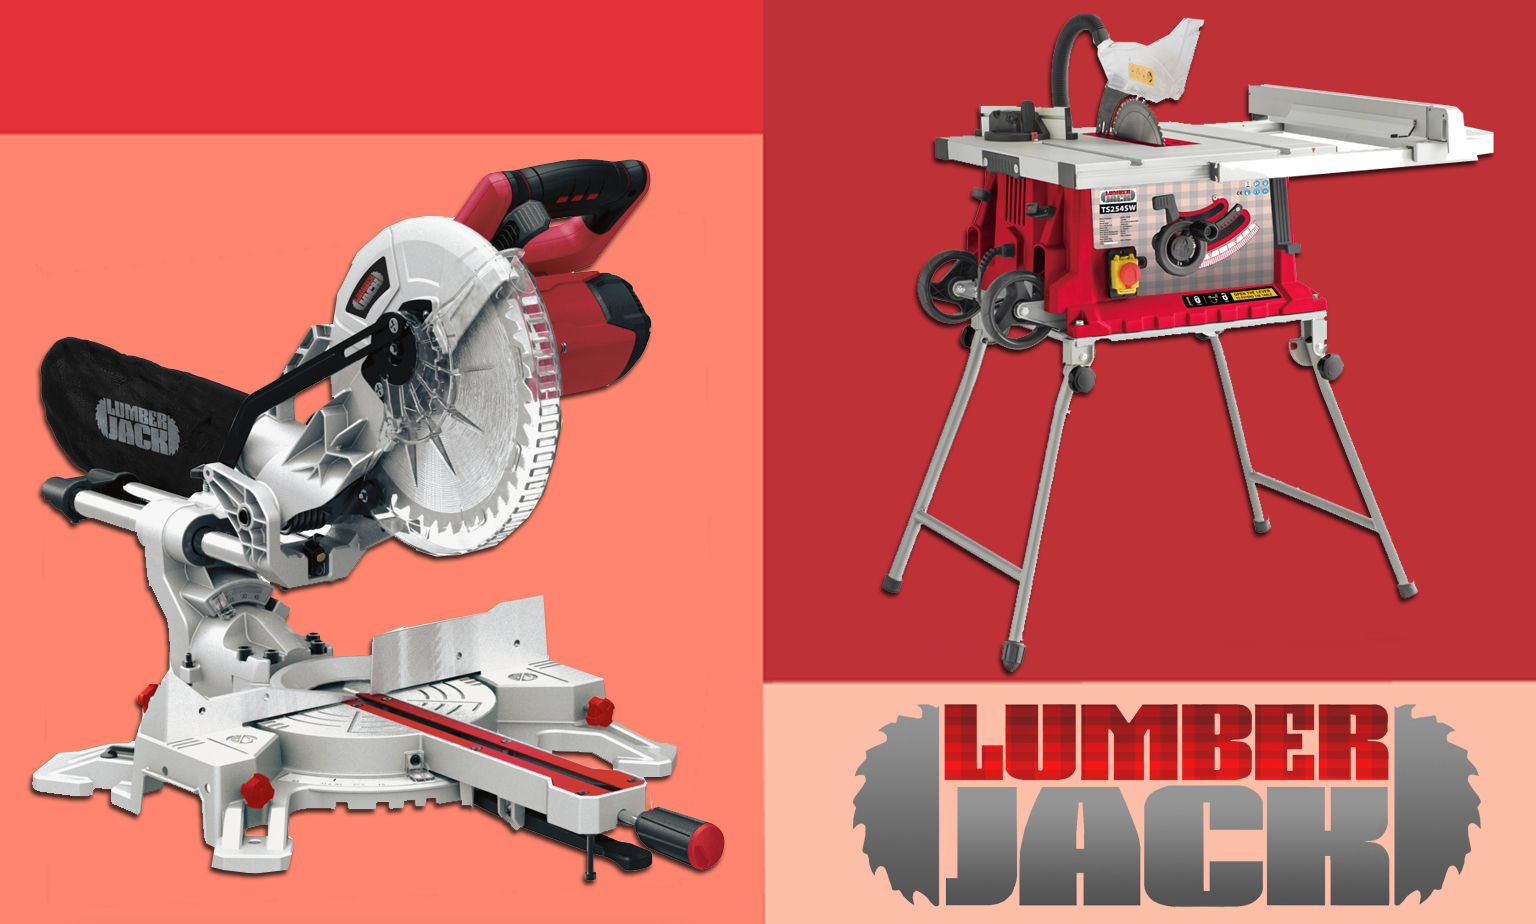 30% off Lumberjack Woodworking Tools